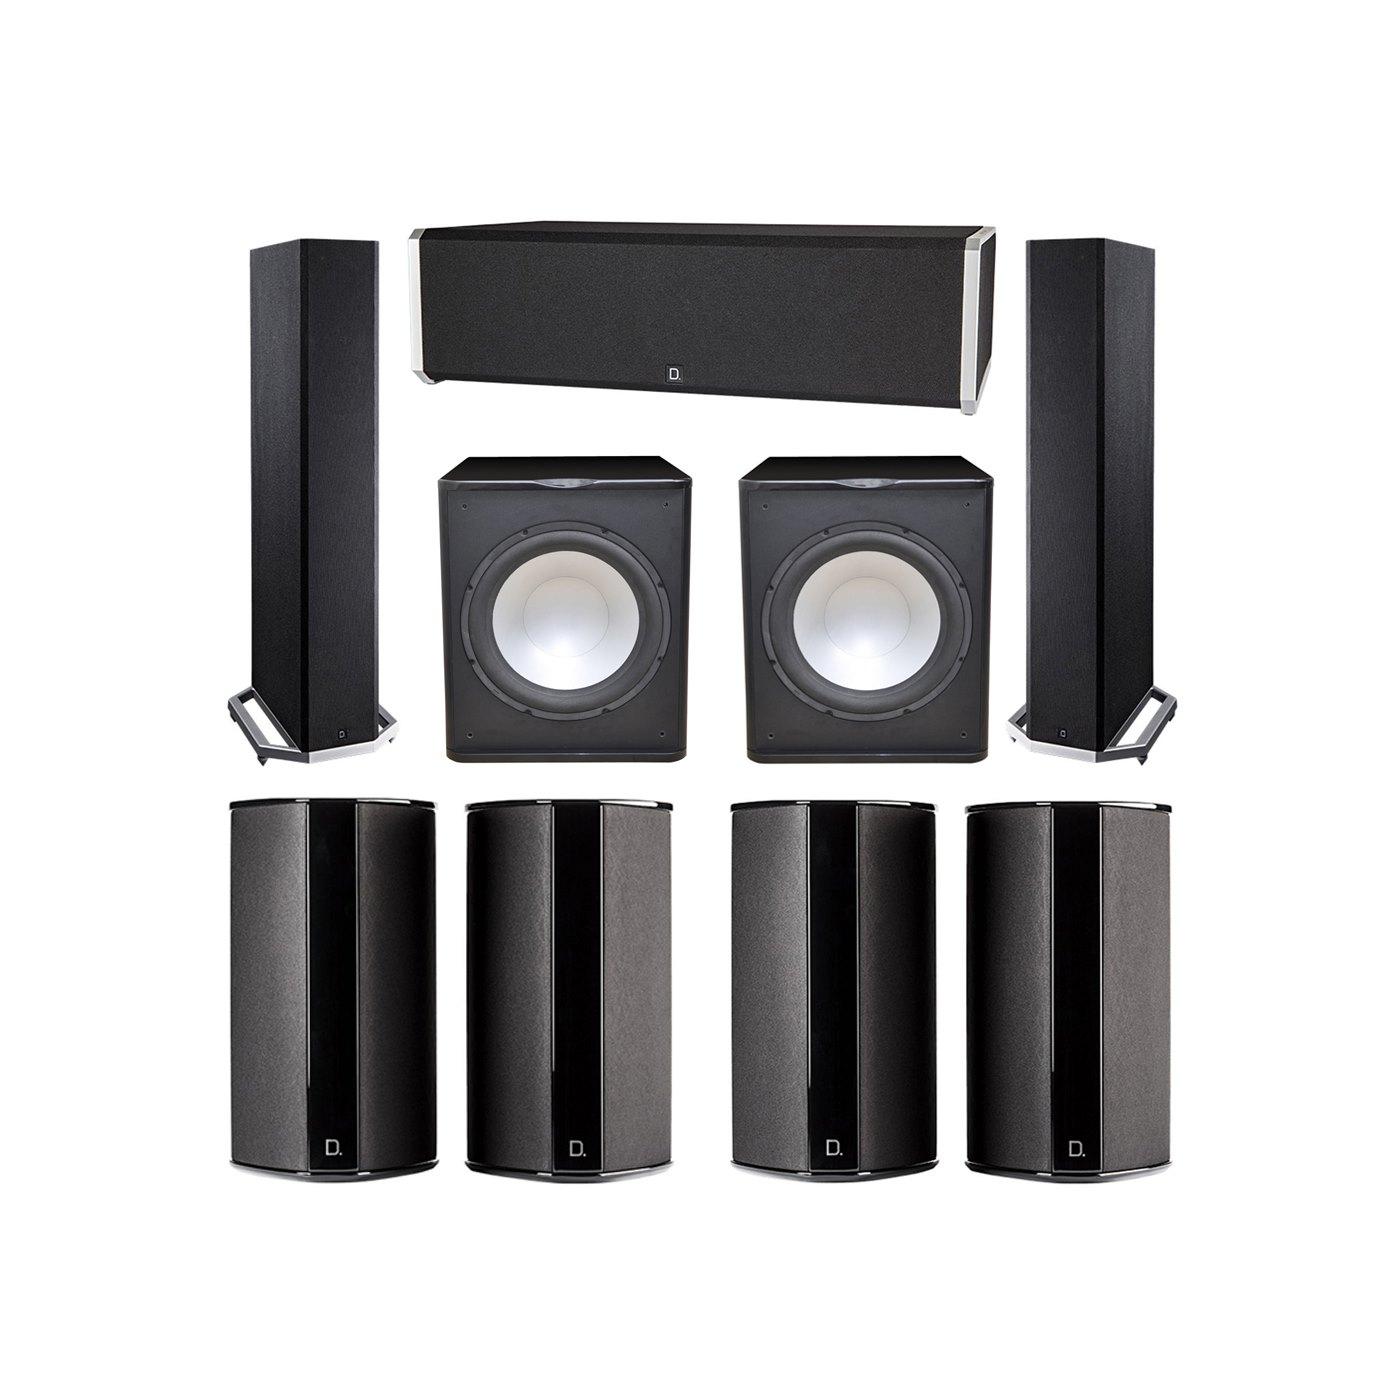 Definitive Technology 7.2 System with 2 BP9020 Tower Speakers, 1 CS9040 Center Channel Speaker, 4 SR9080 Surround Speaker, 2 Premier Acoustic PA-150 Subwoofer